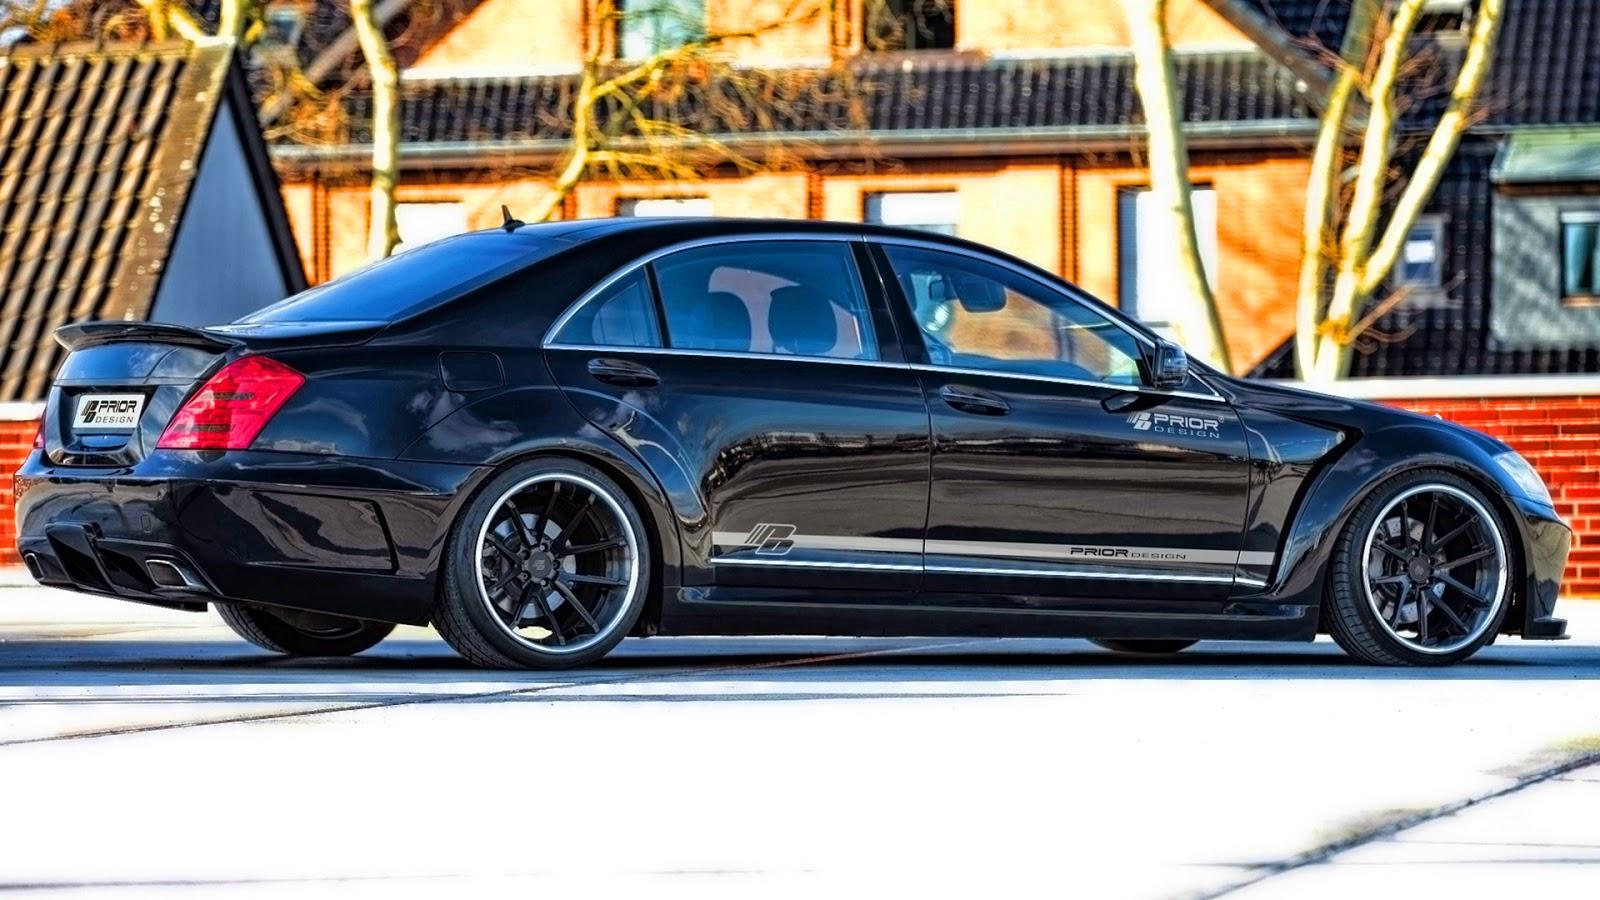 Prior design mercedes benz classe s w221 v2 widebody carwp for Mercedes benz design